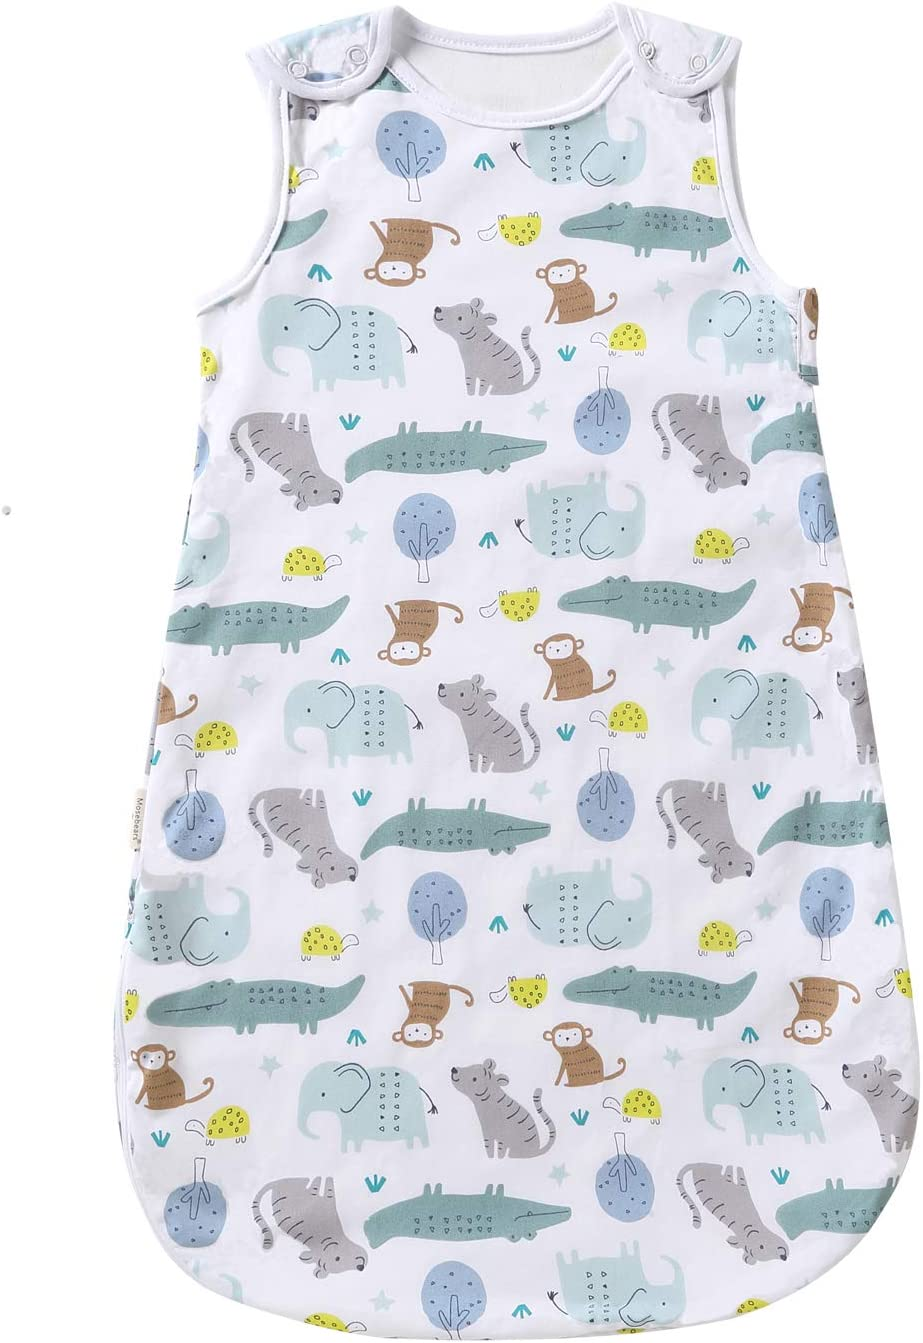 dise/ño de dibujos animados para beb/é para primavera//verano sin mangas blanco Para/íso de animales Talla:S//0-6 Monate Saco de dormir para beb/é lavable 1,0 tog